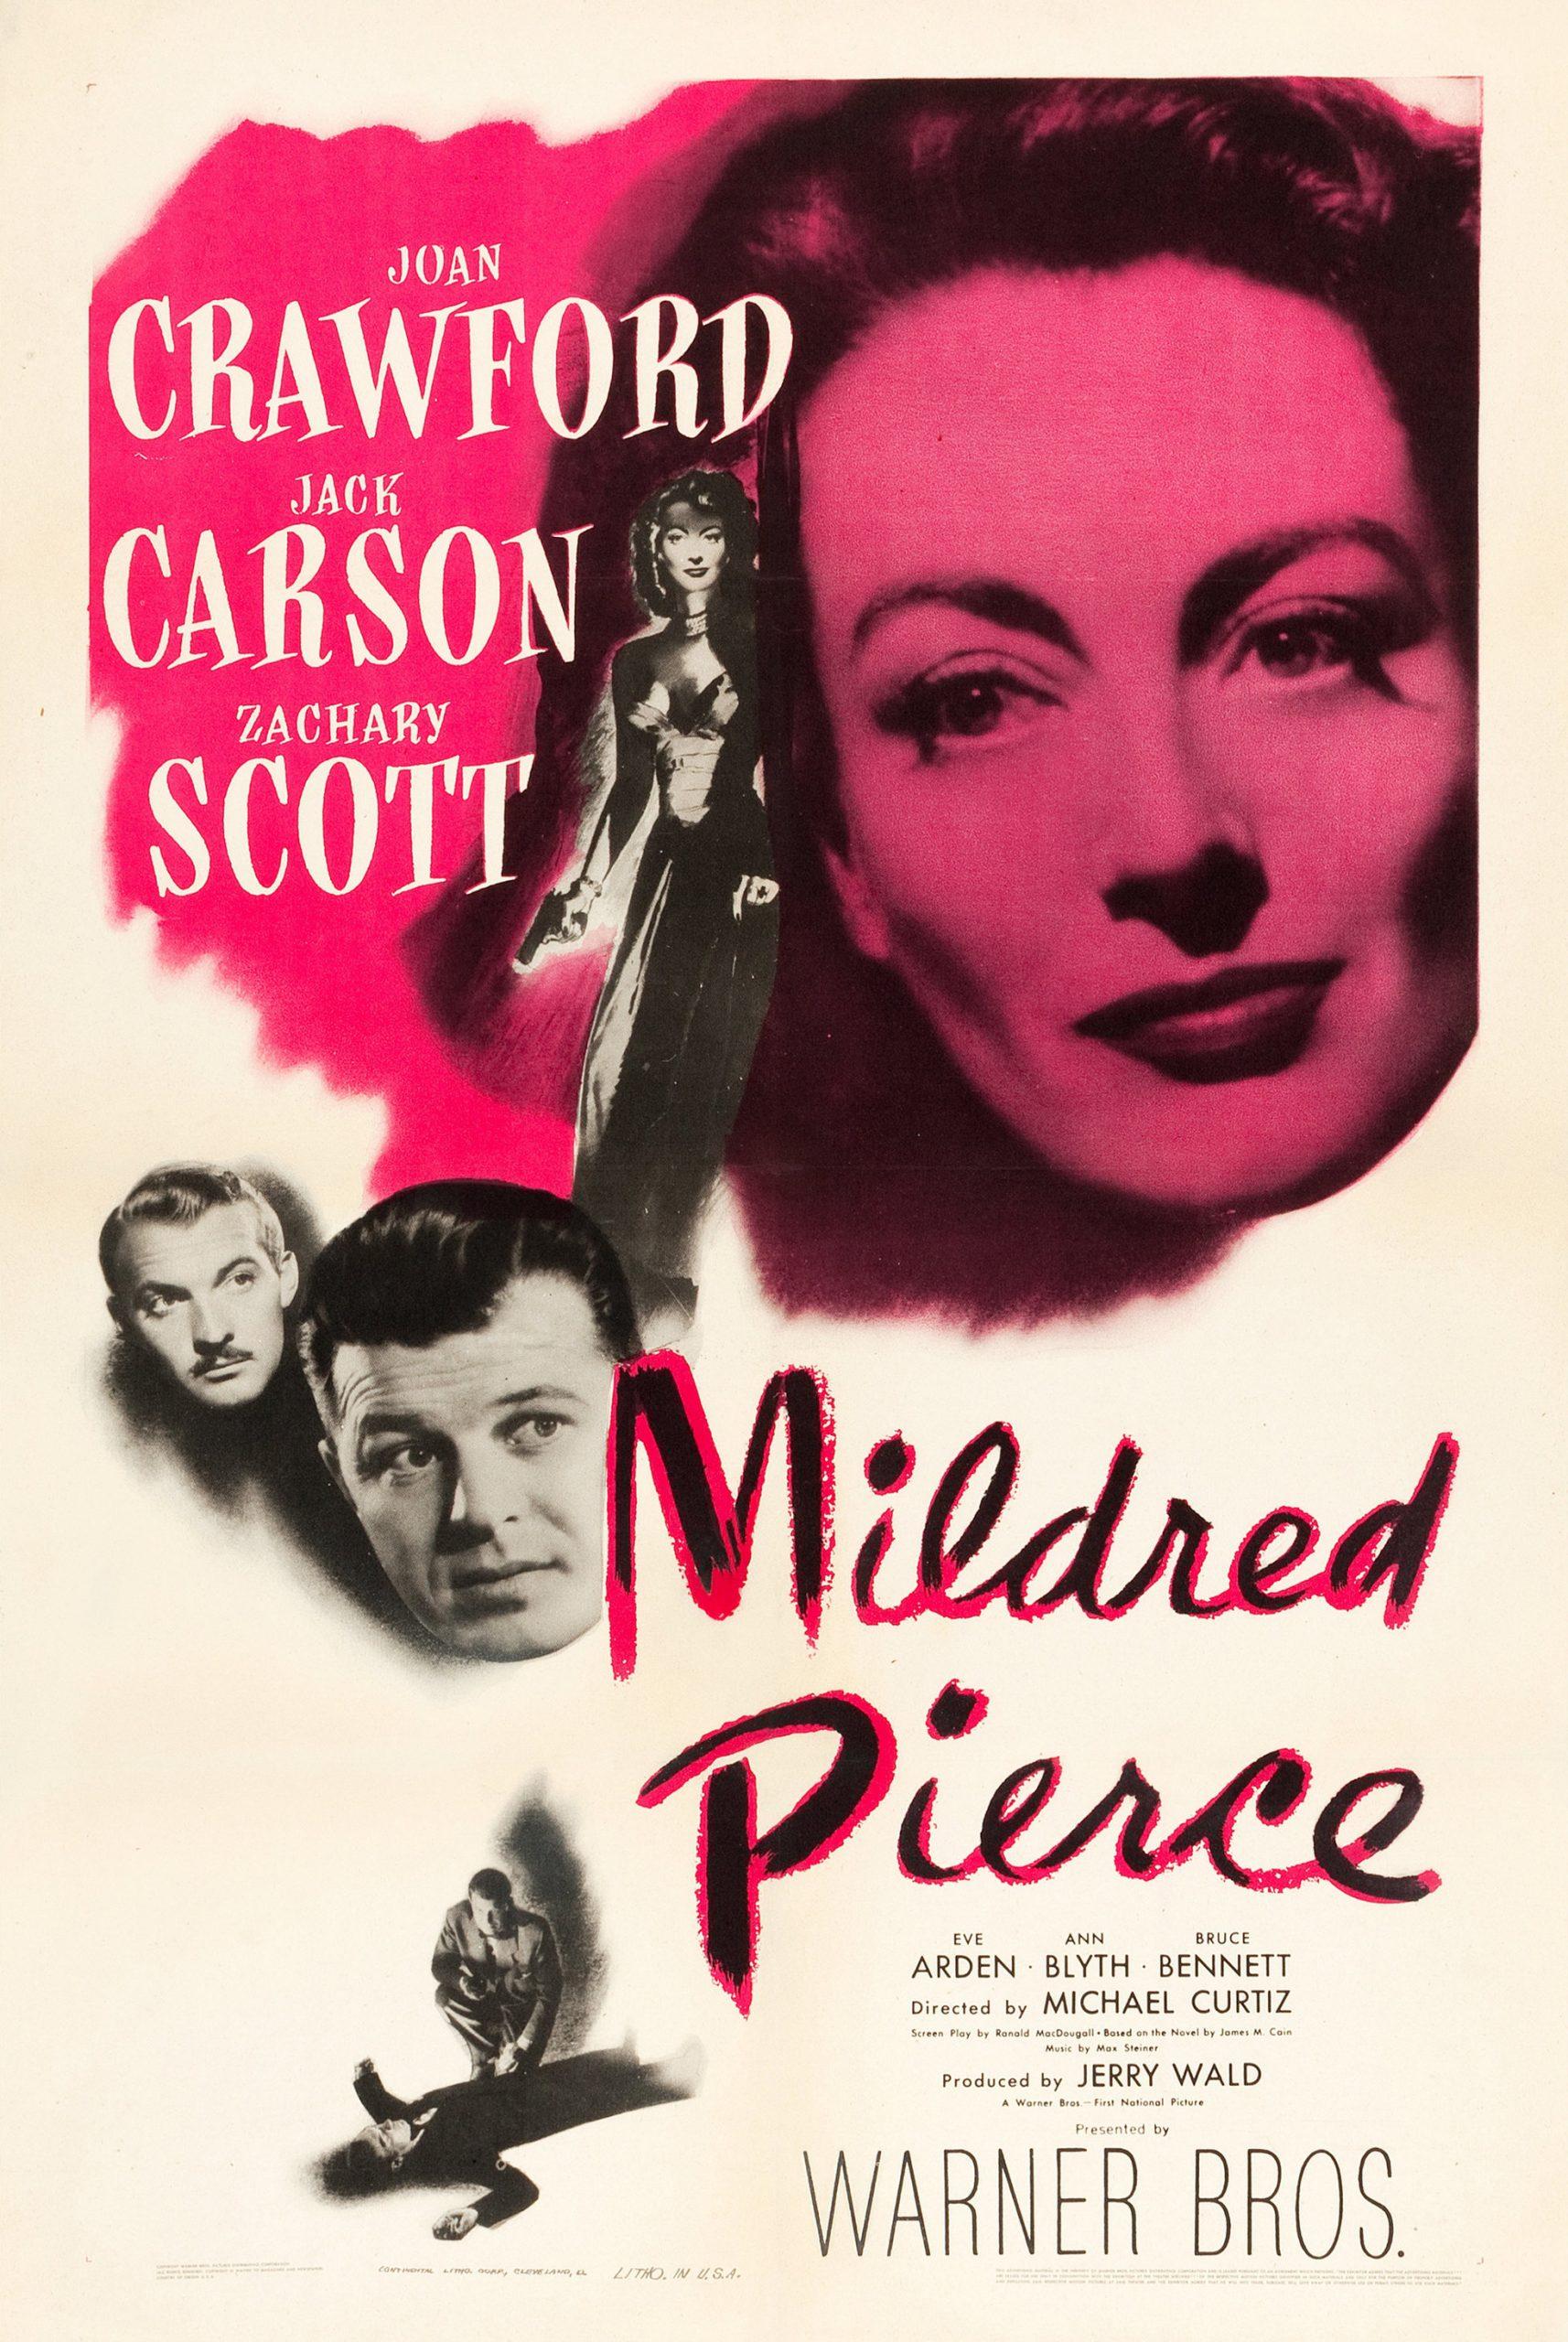 Mildred Pierce Opens